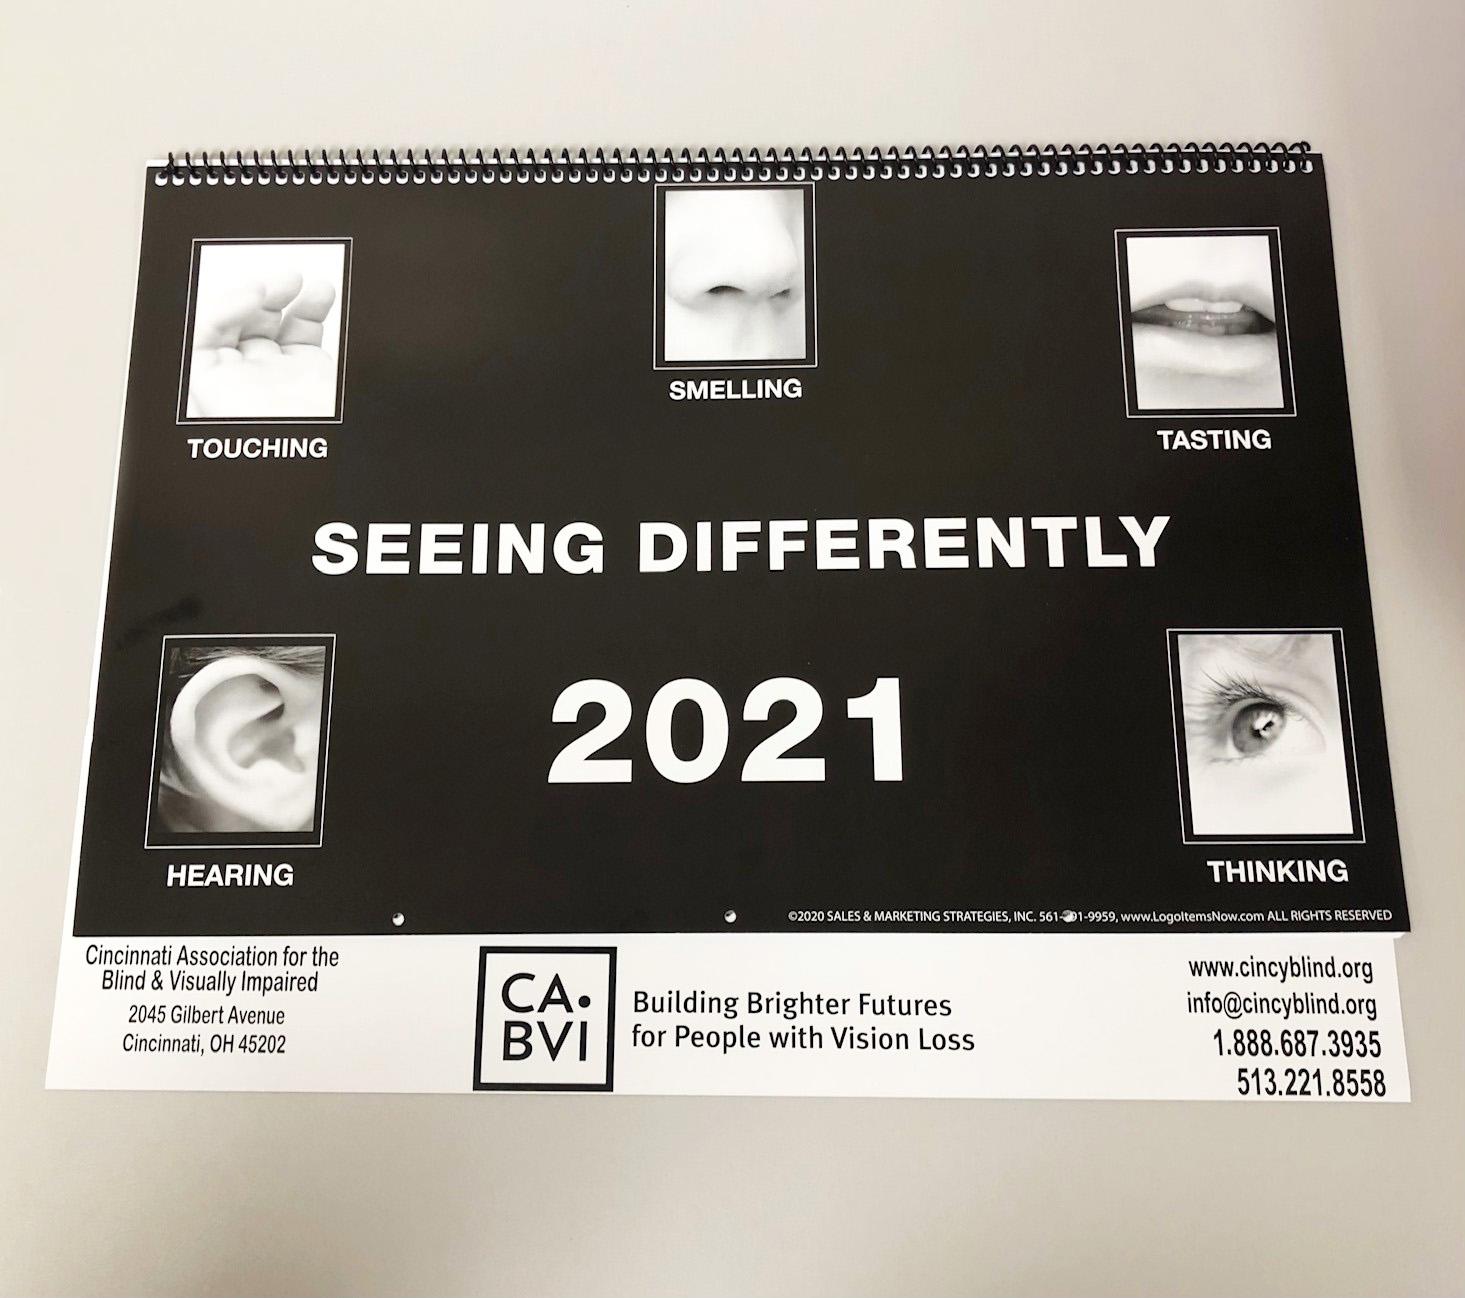 2021 Large Print Calendar intended for 2021 Large Print Calendar Monthly